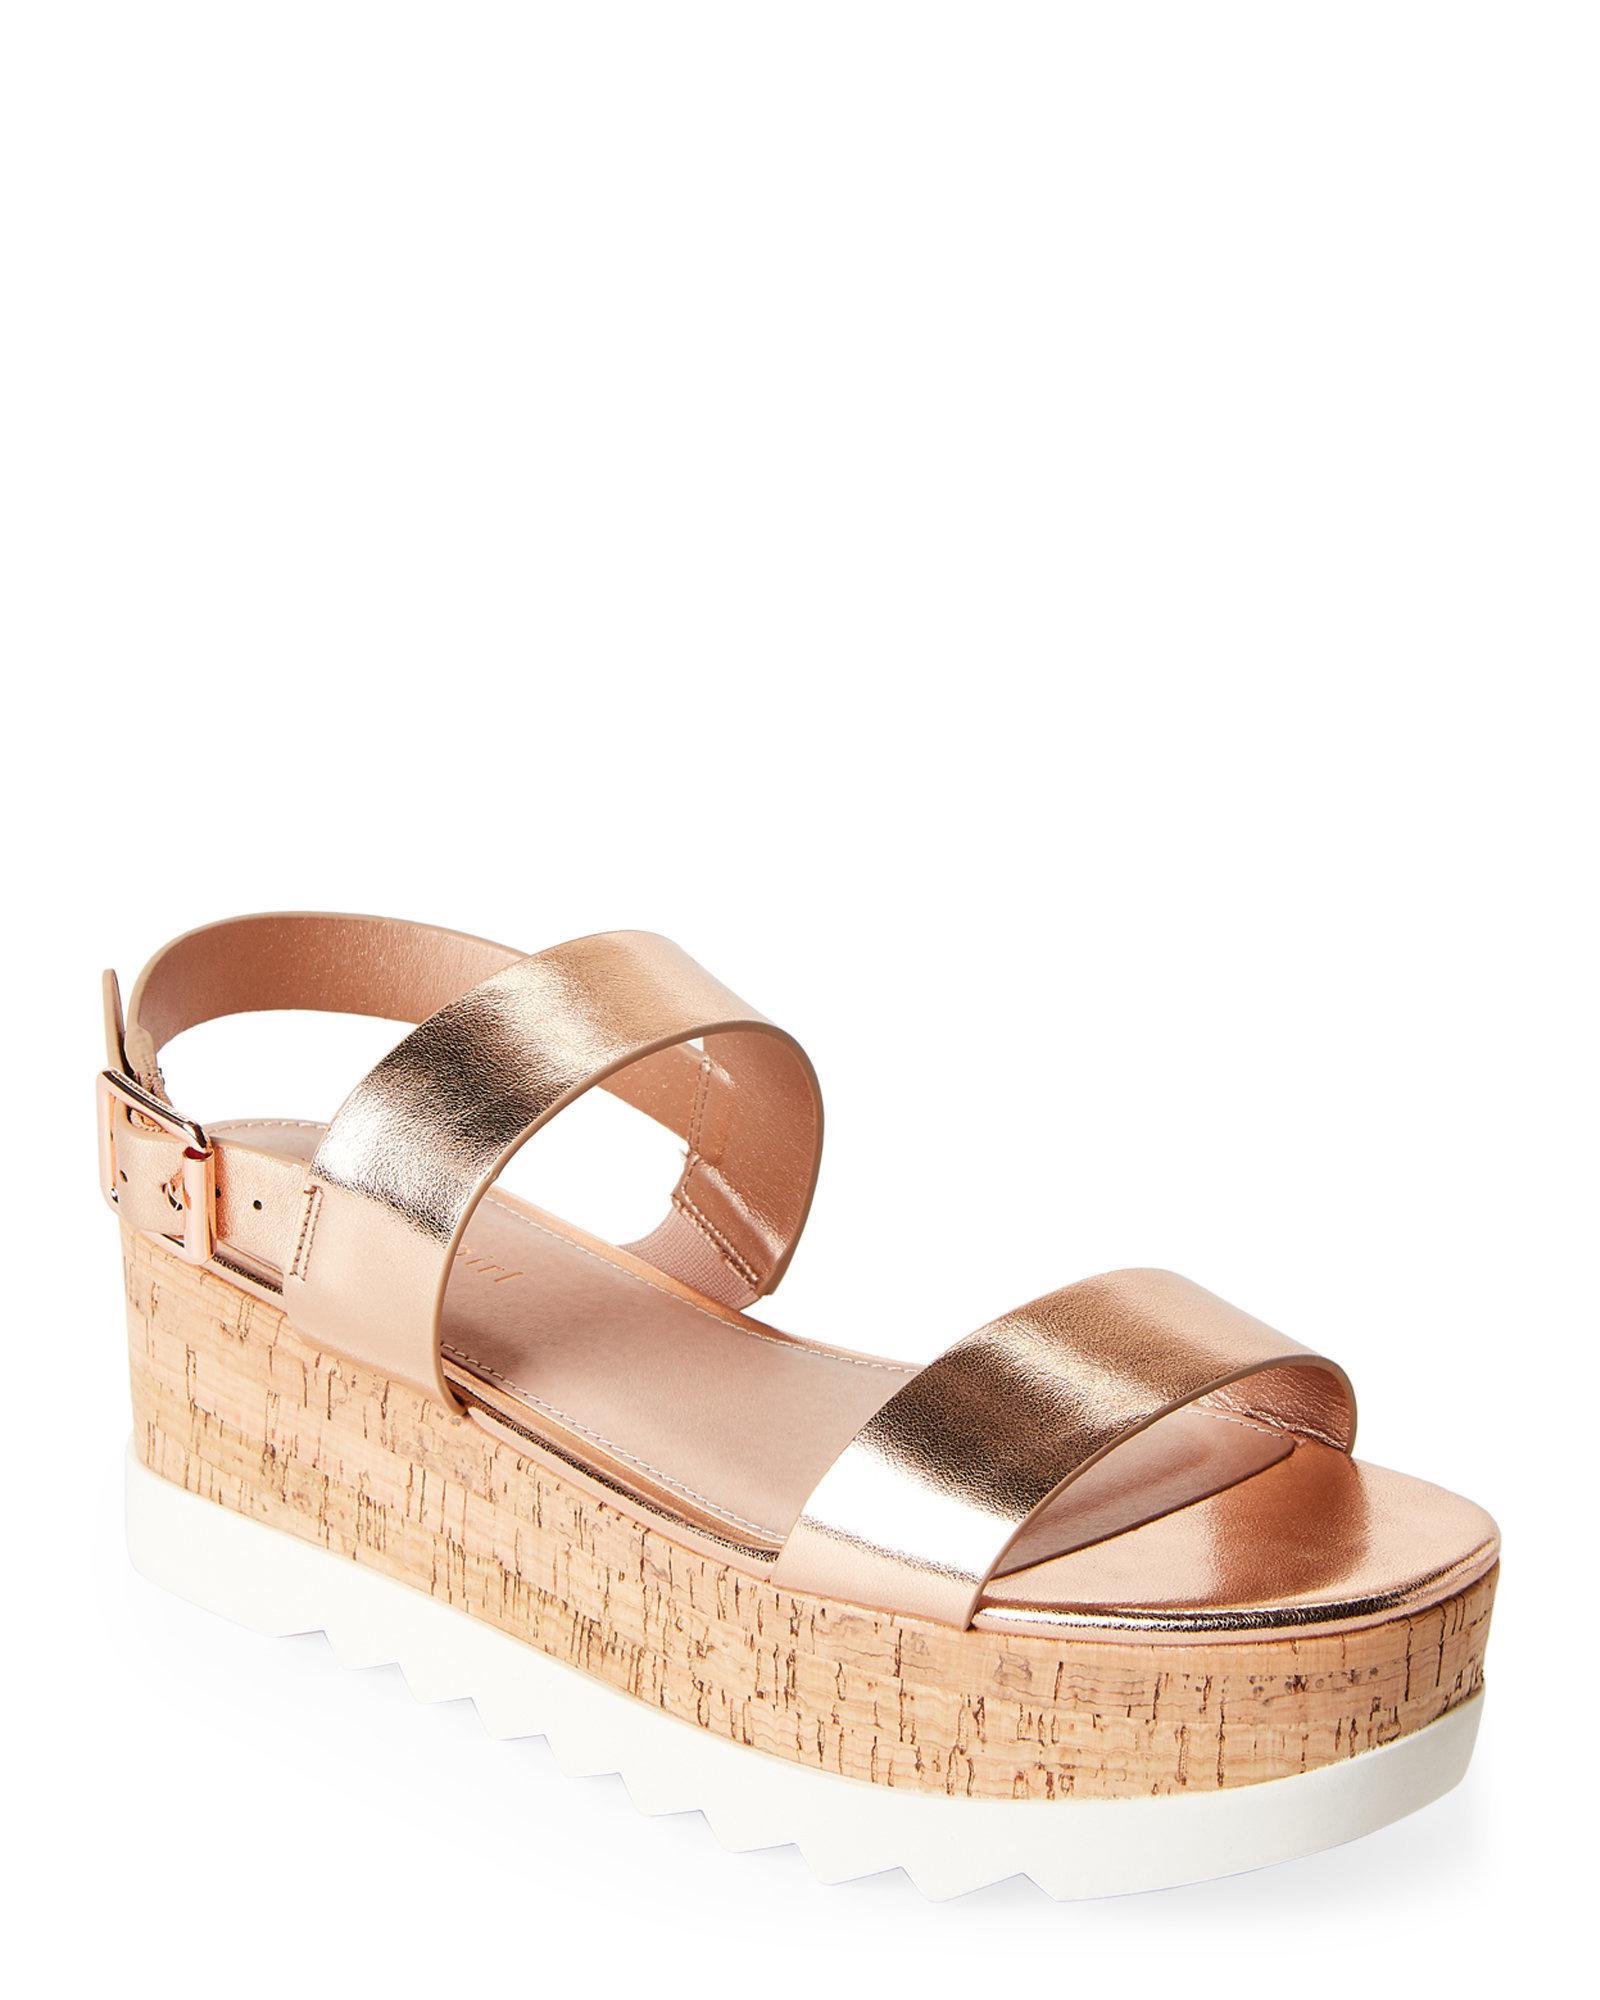 bacbcb1e31b Lyst - Madden Girl Rose Gold Suga Flatform Slingback Sandals